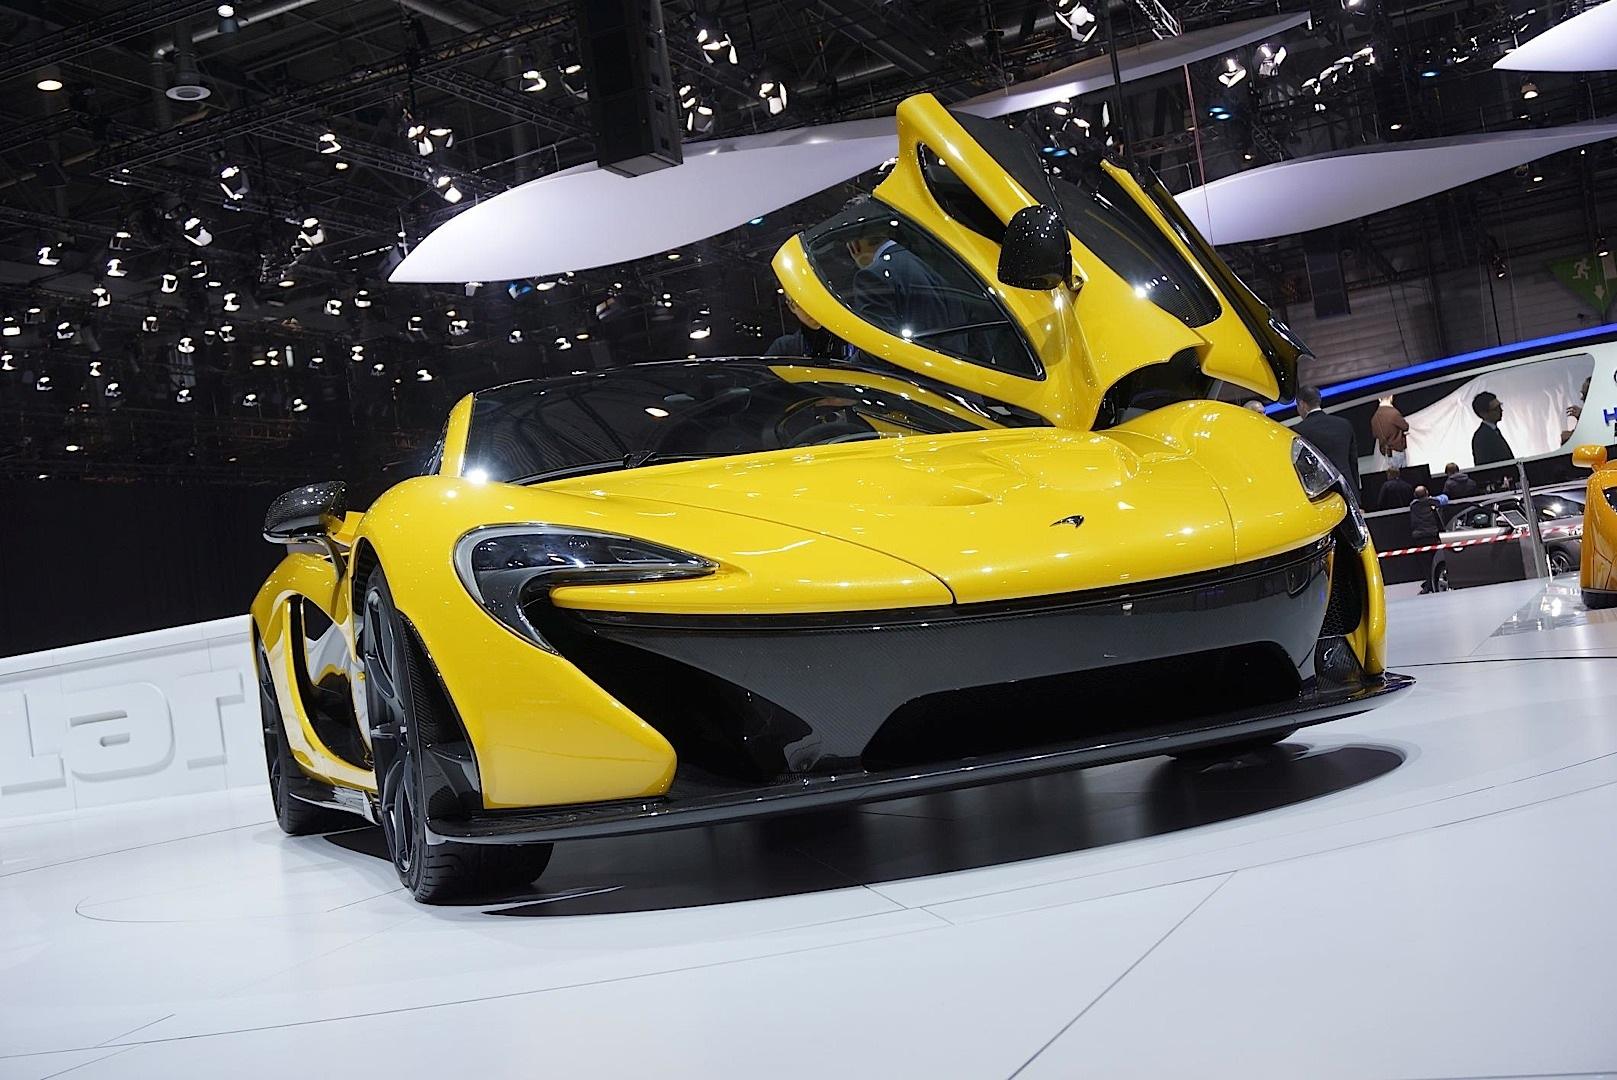 McLaren Tuner Hypercar Development Talks P1 TriTurbo Build Exposes Engine Bay  autoevolution